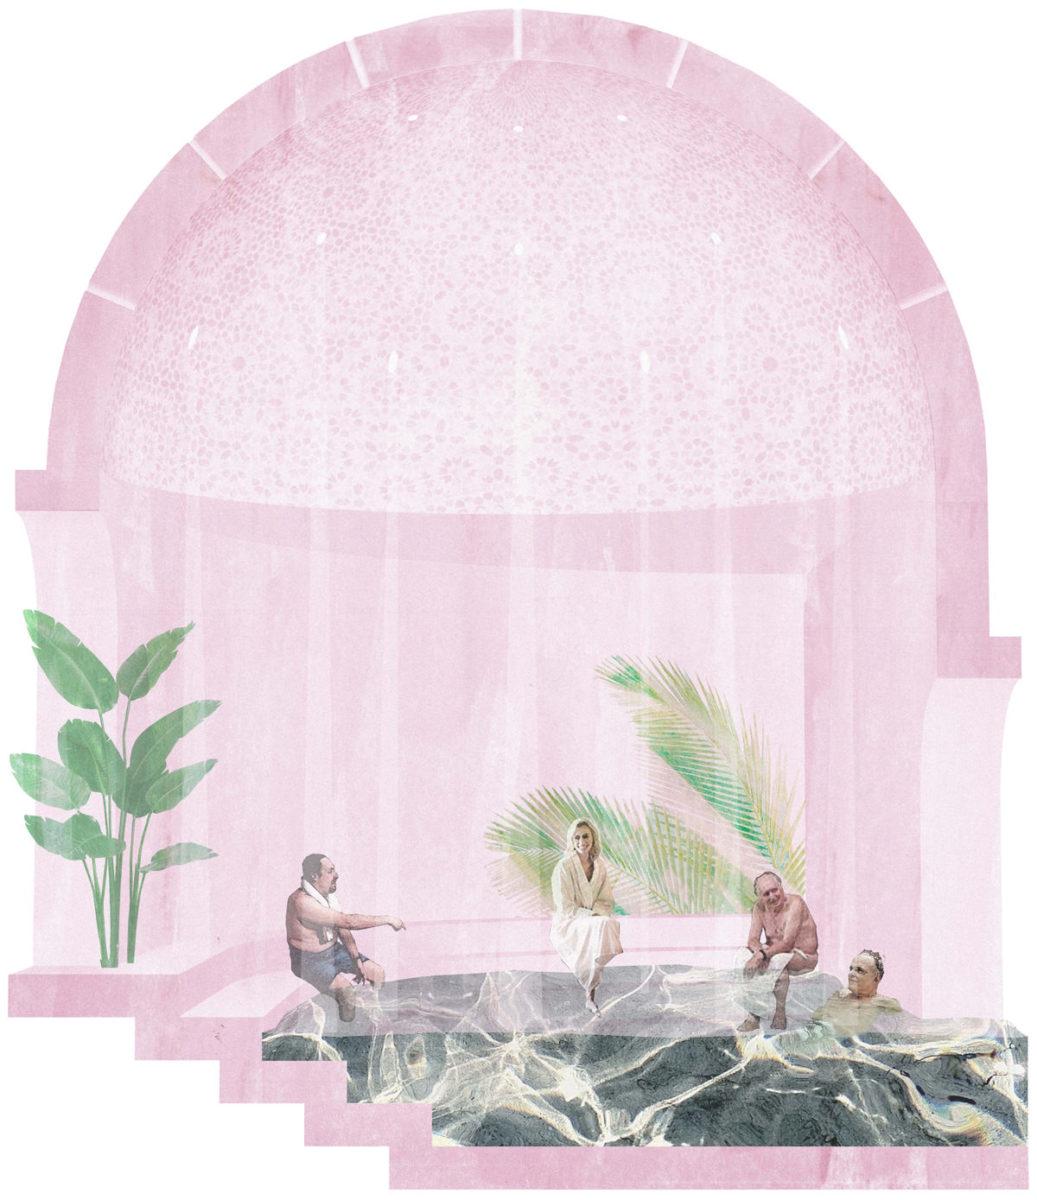 Production design by Alaric Campbell-Garratt